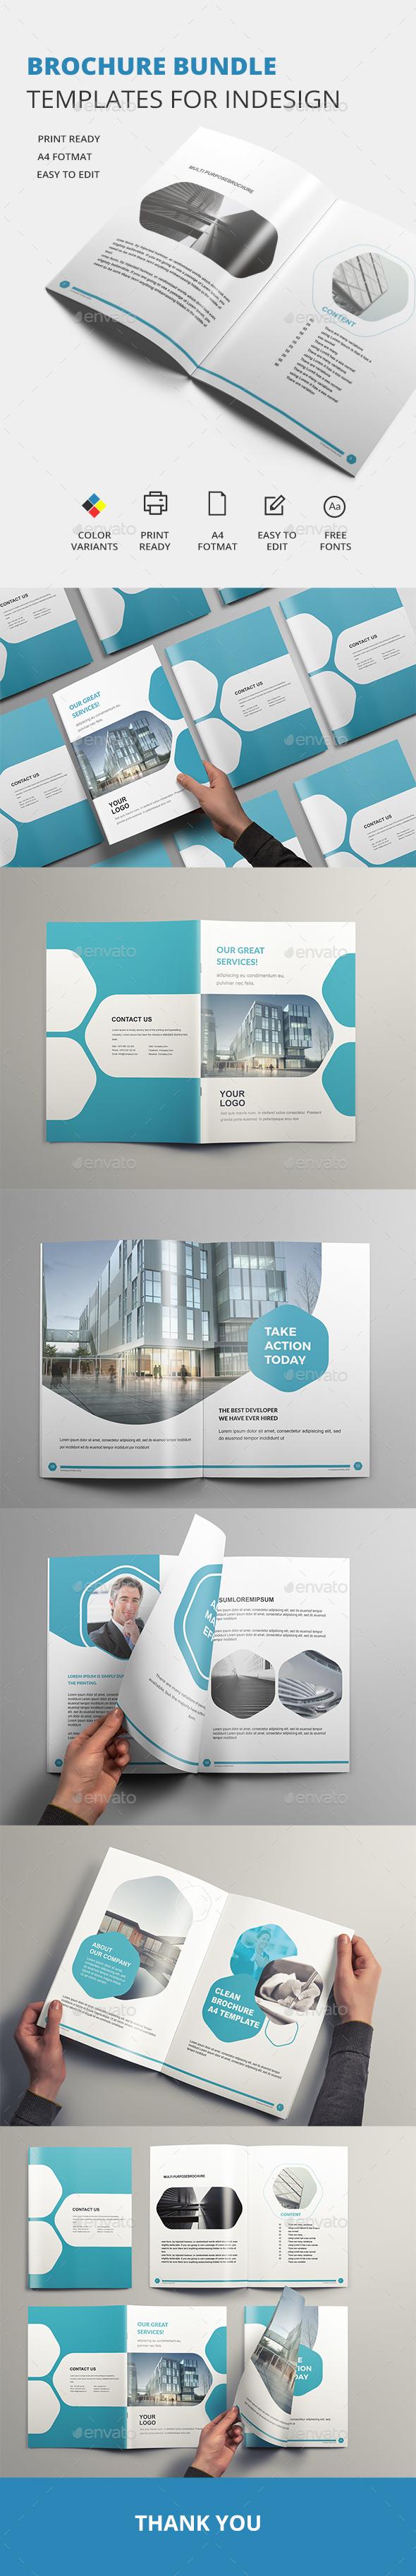 Brochure Bundle - Templates for Indesign - Brochures Print Templates